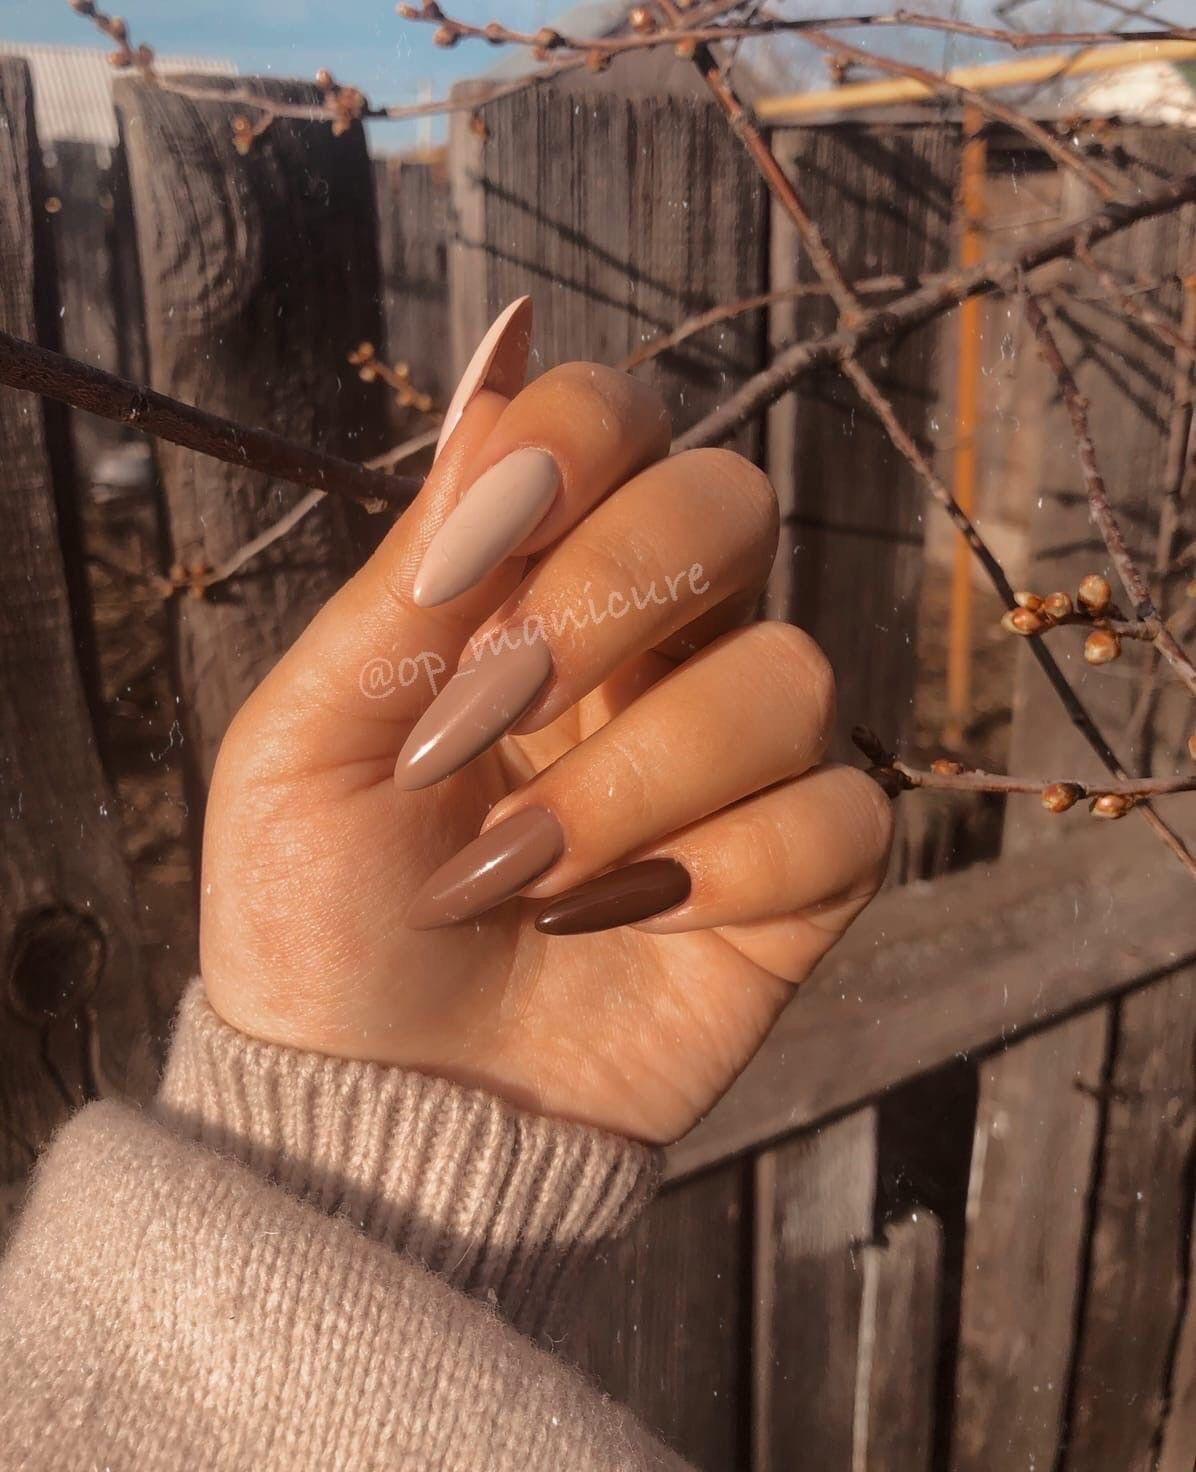 Light Brown Acrylic Nails : light, brown, acrylic, nails, Nails, Design, Beige, Nails,, Brown, Acrylic